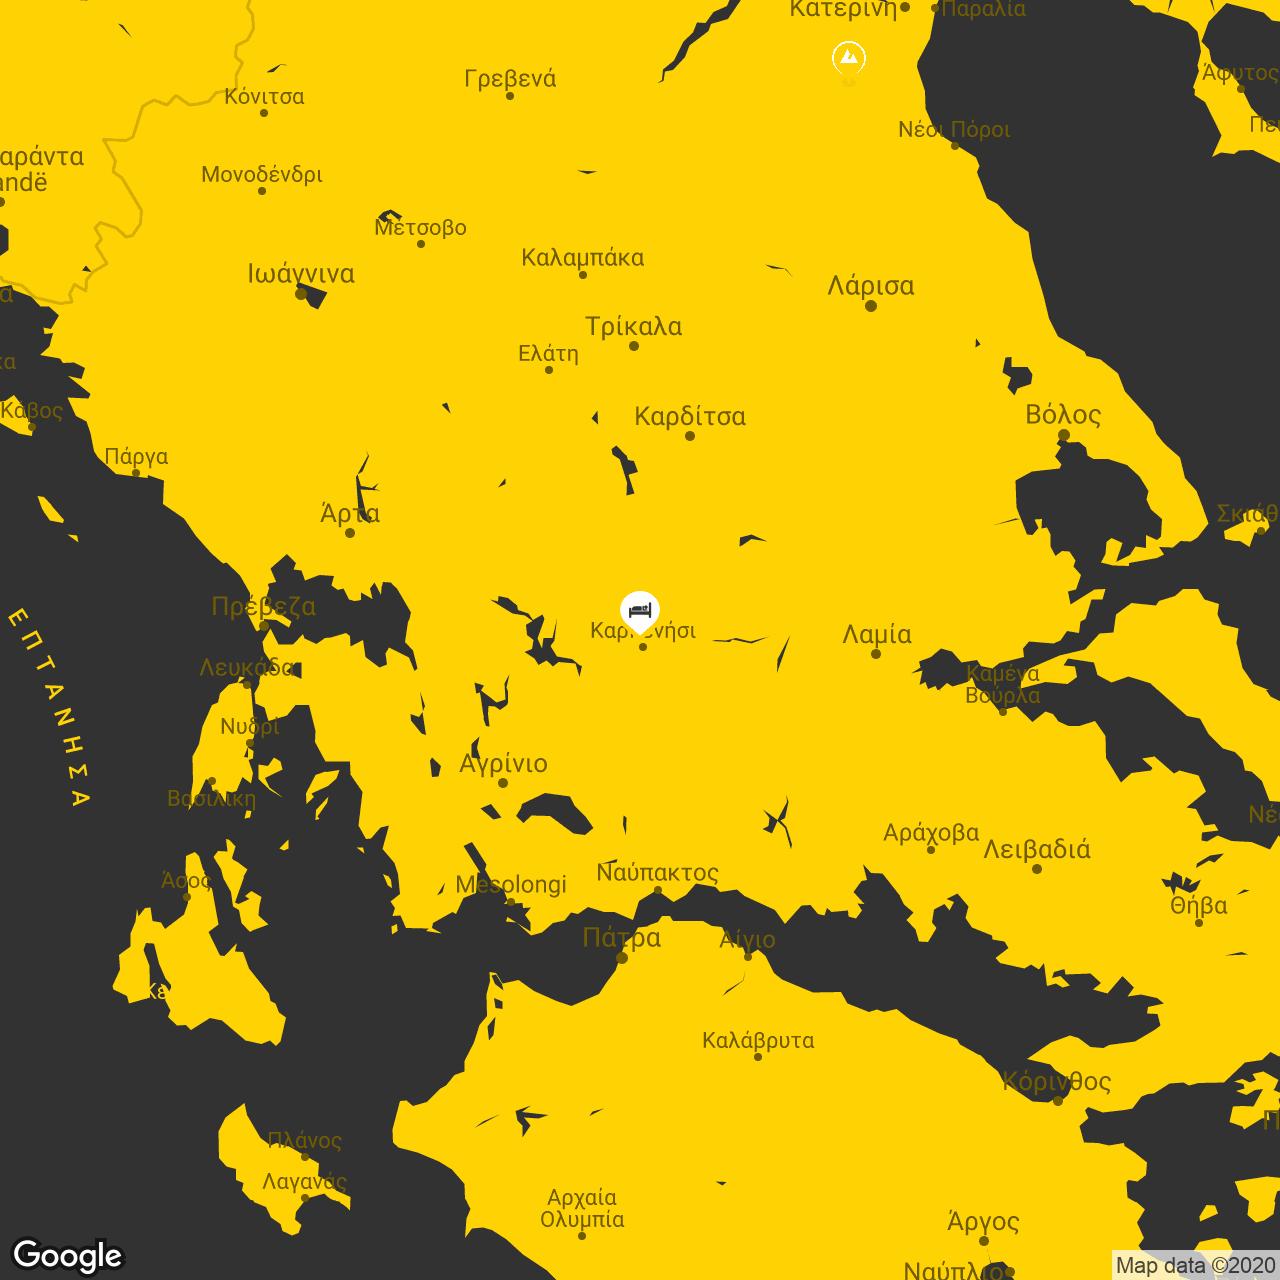 karpenisi map 2